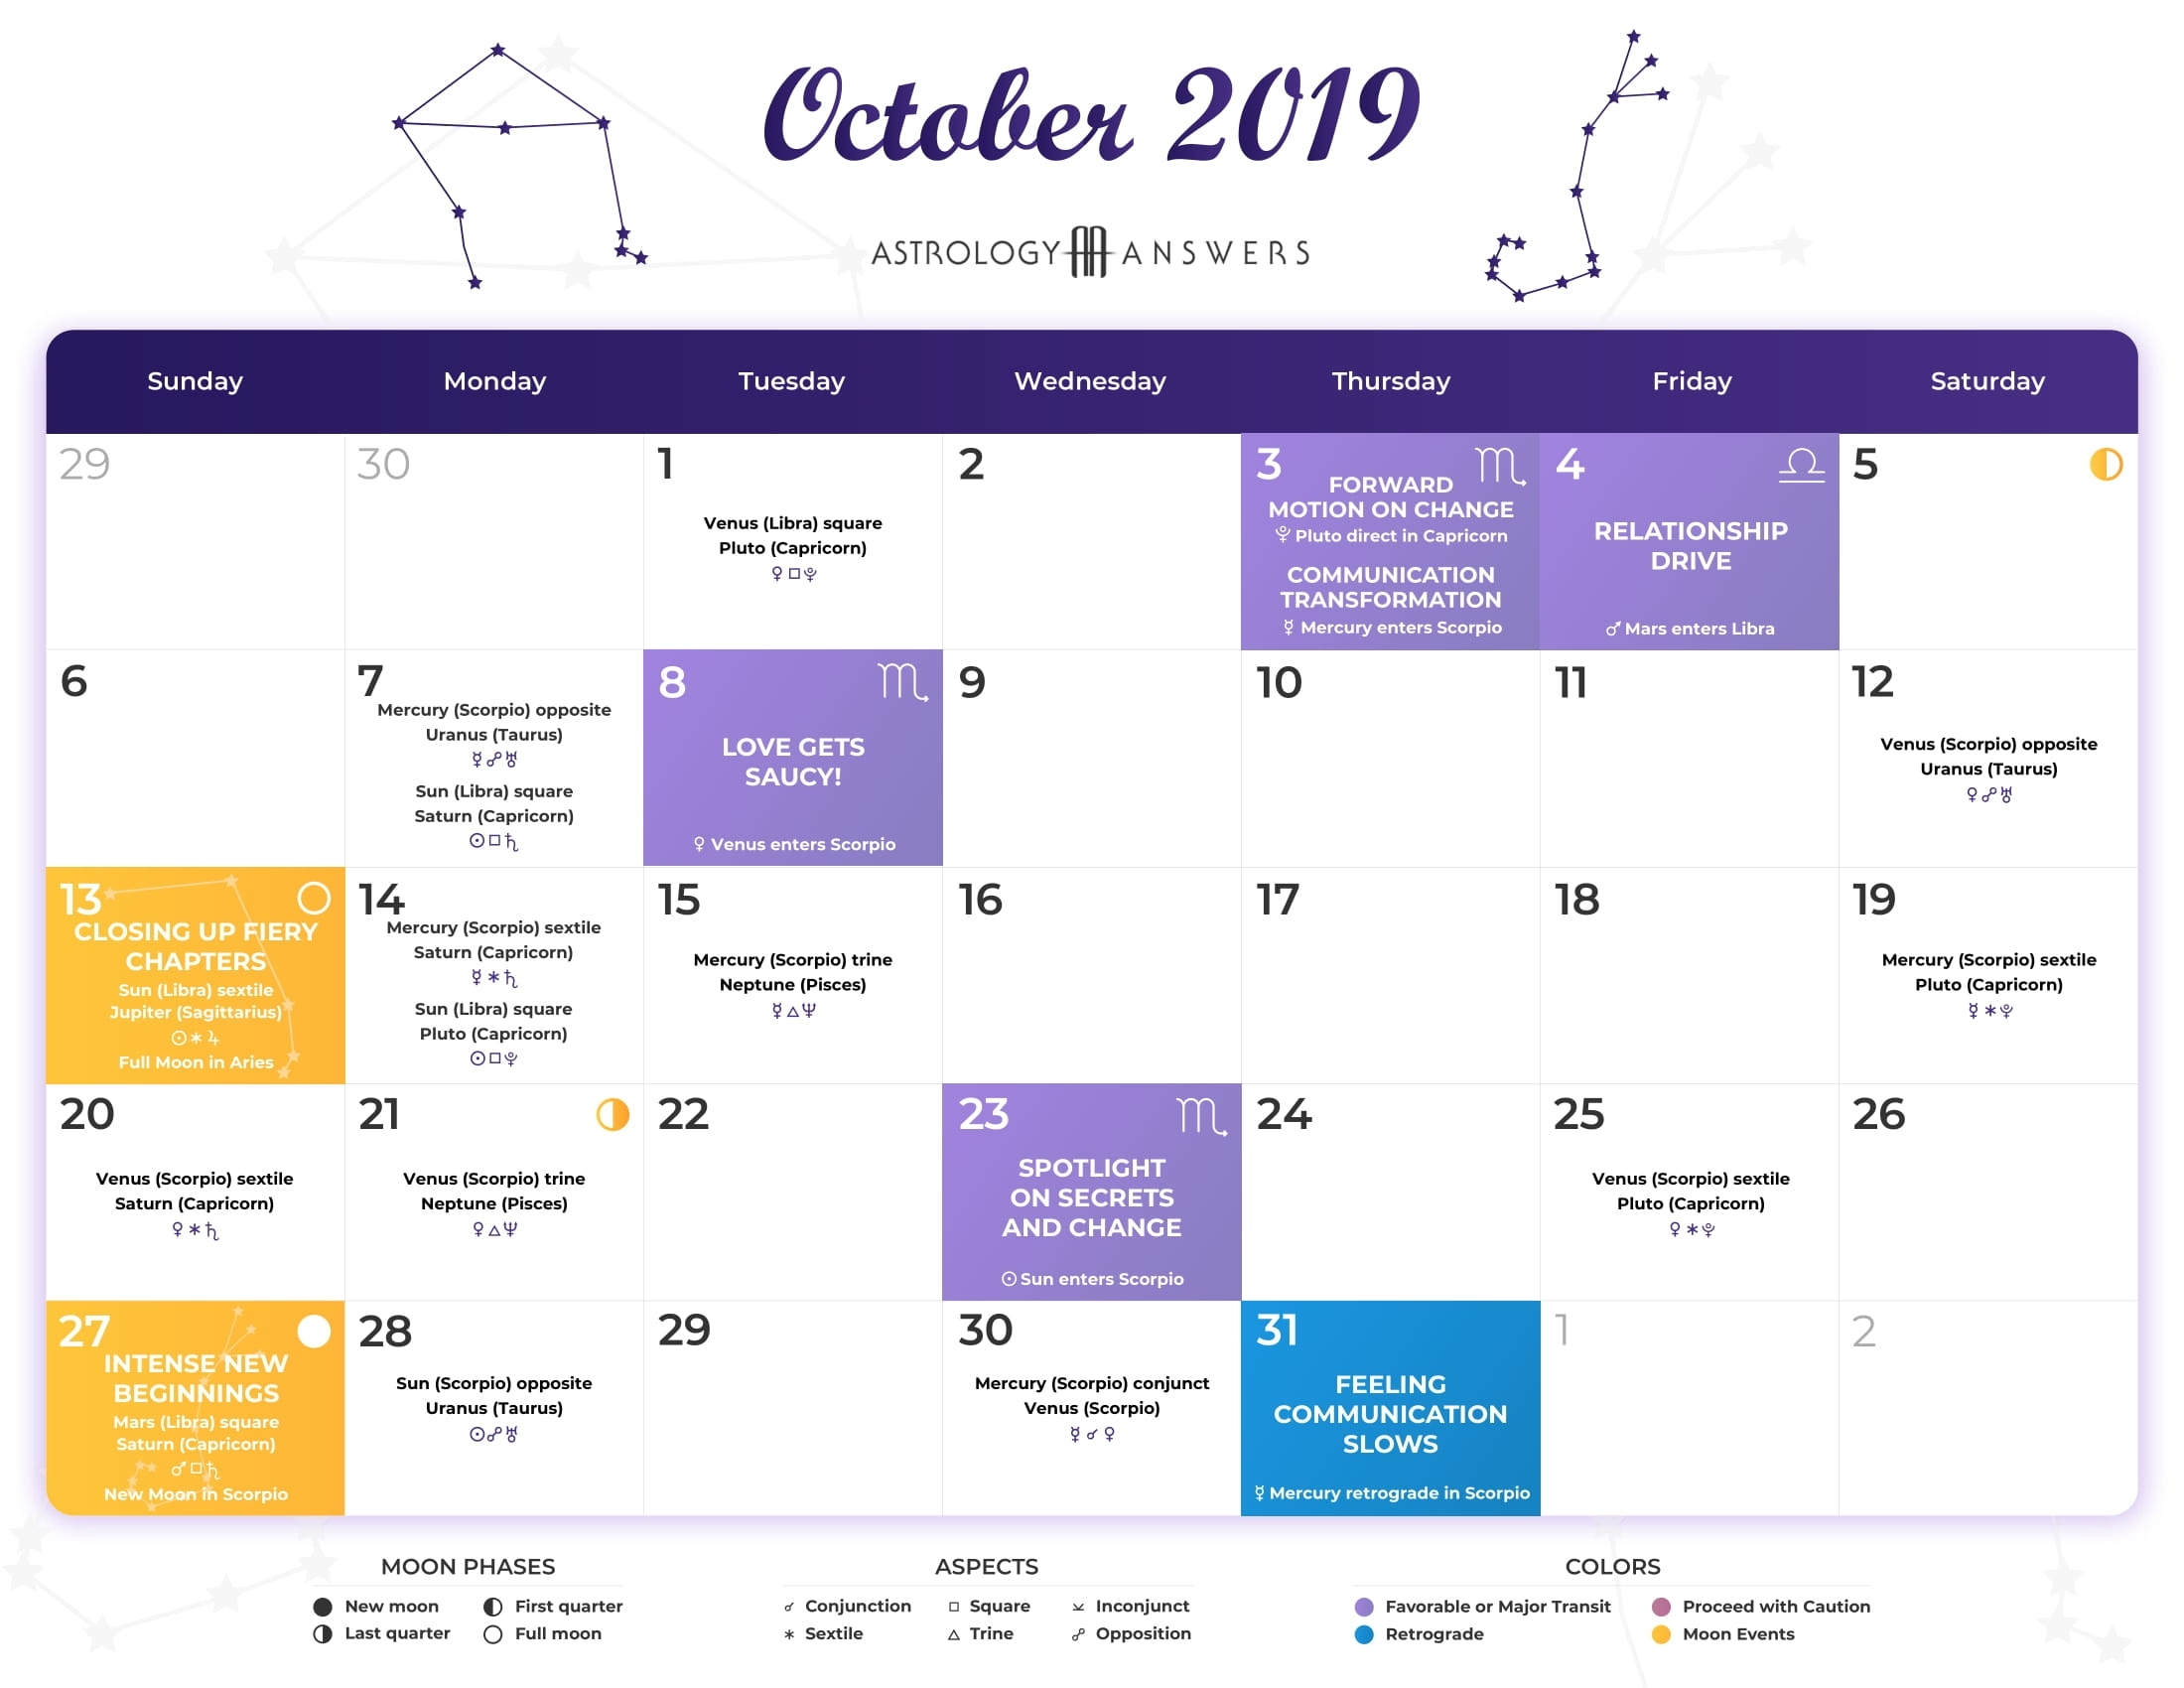 Astrology Calendar - October 2019 | Astrologyanswers